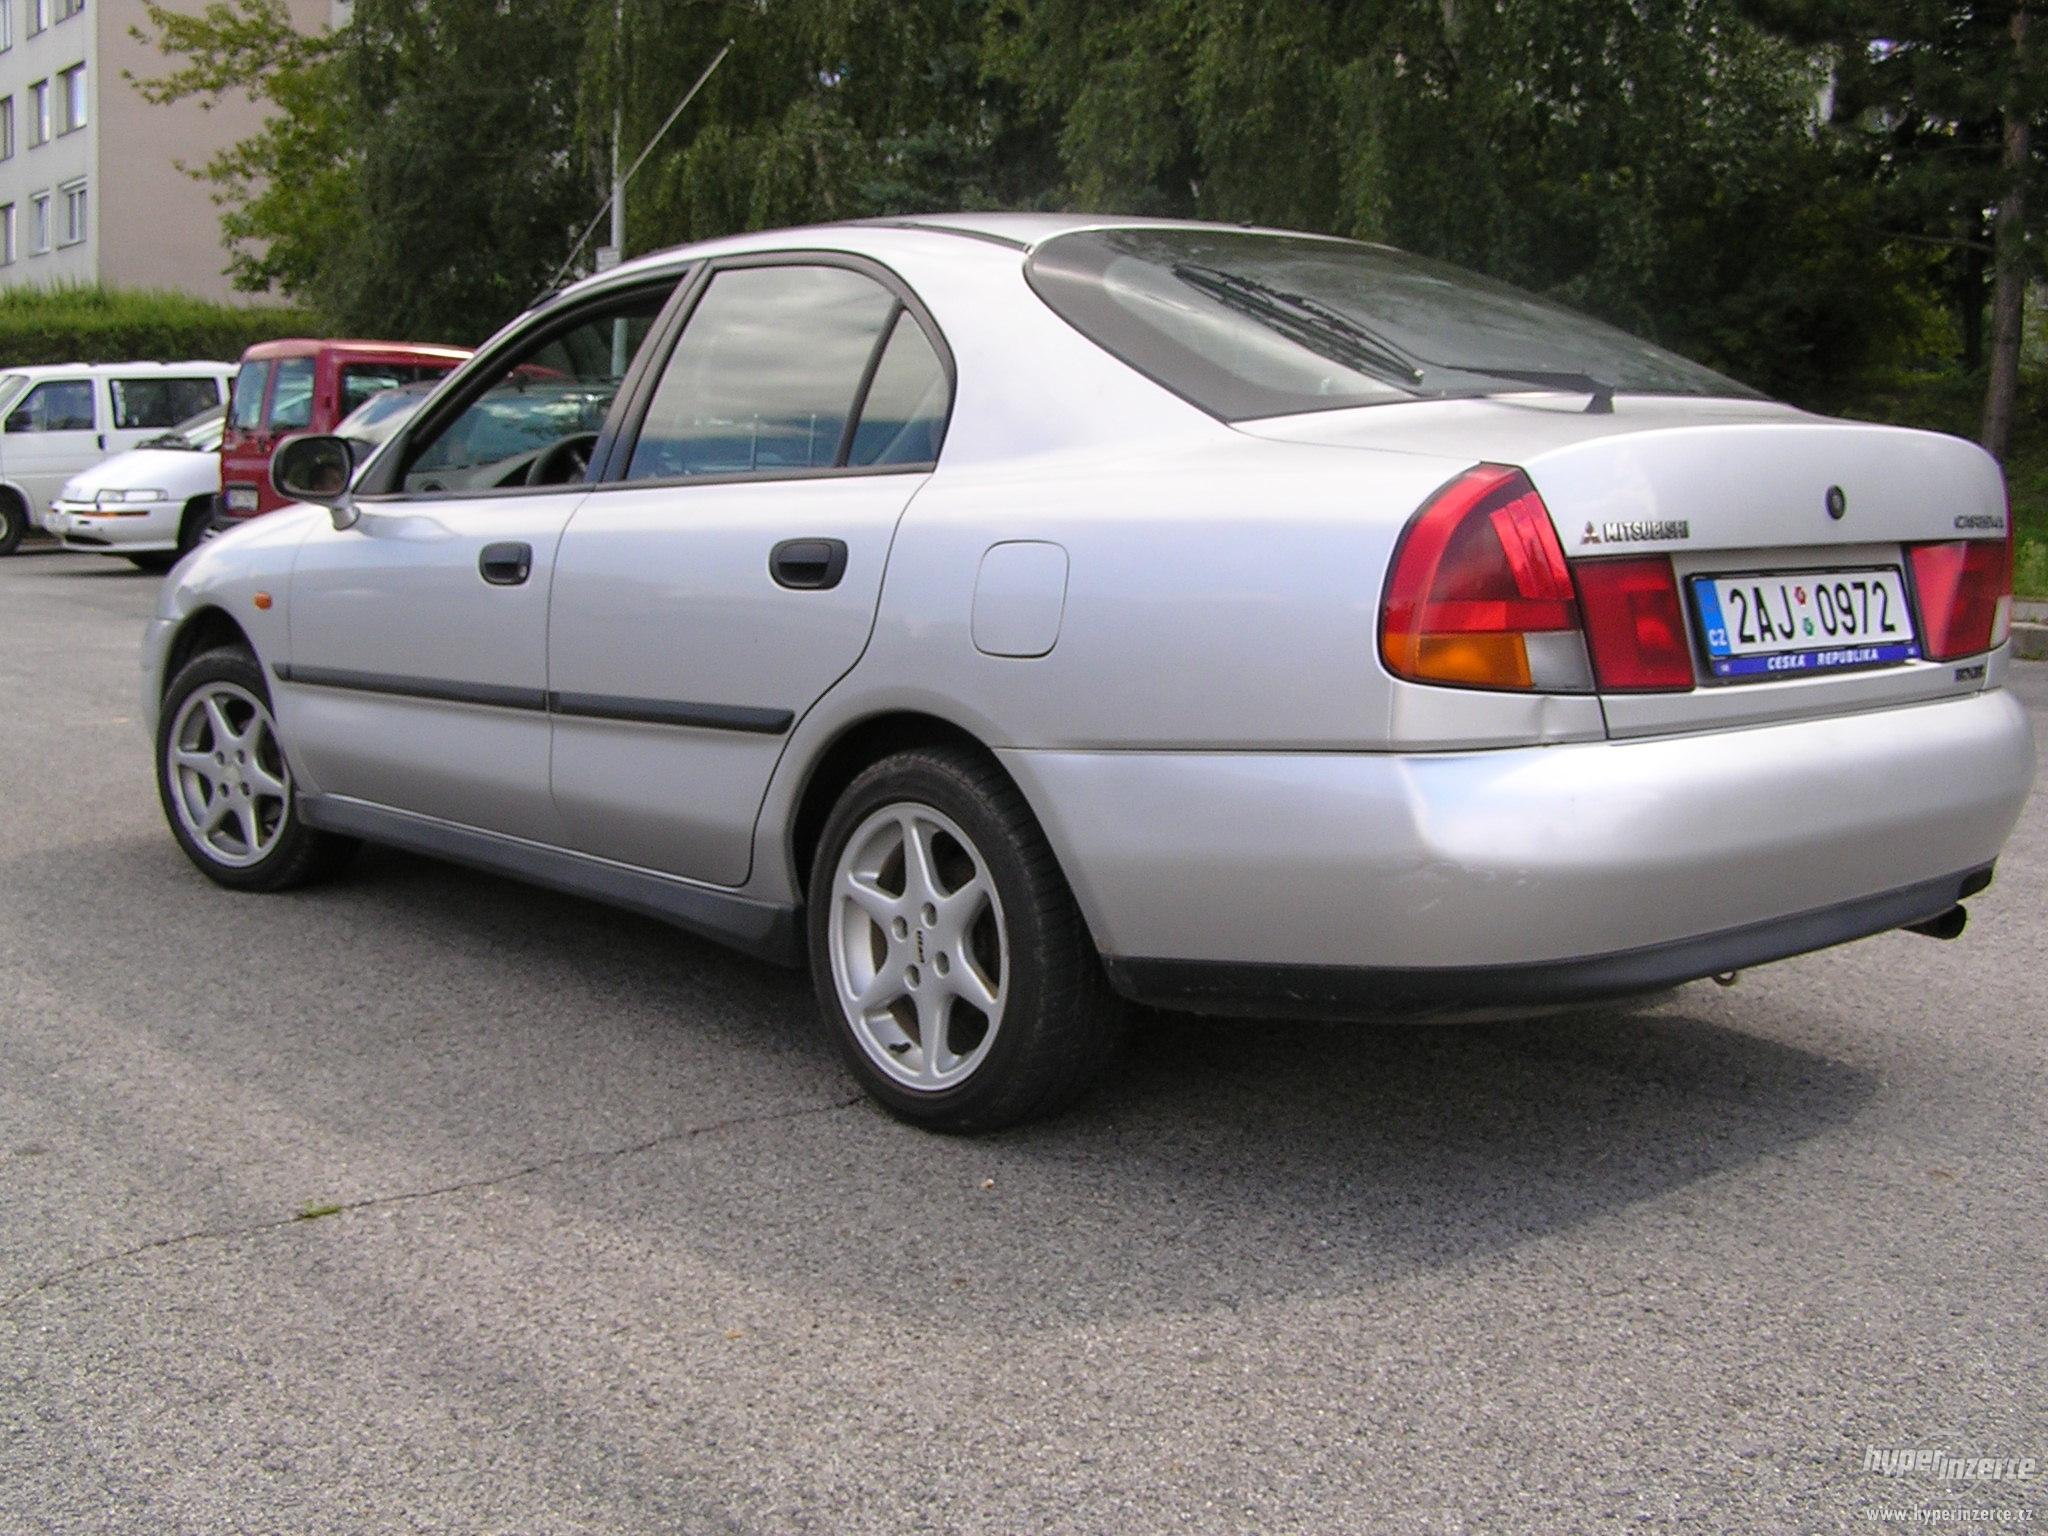 Mitsubishi Carisma I 1995 - 1999 Hatchback 5 door #5